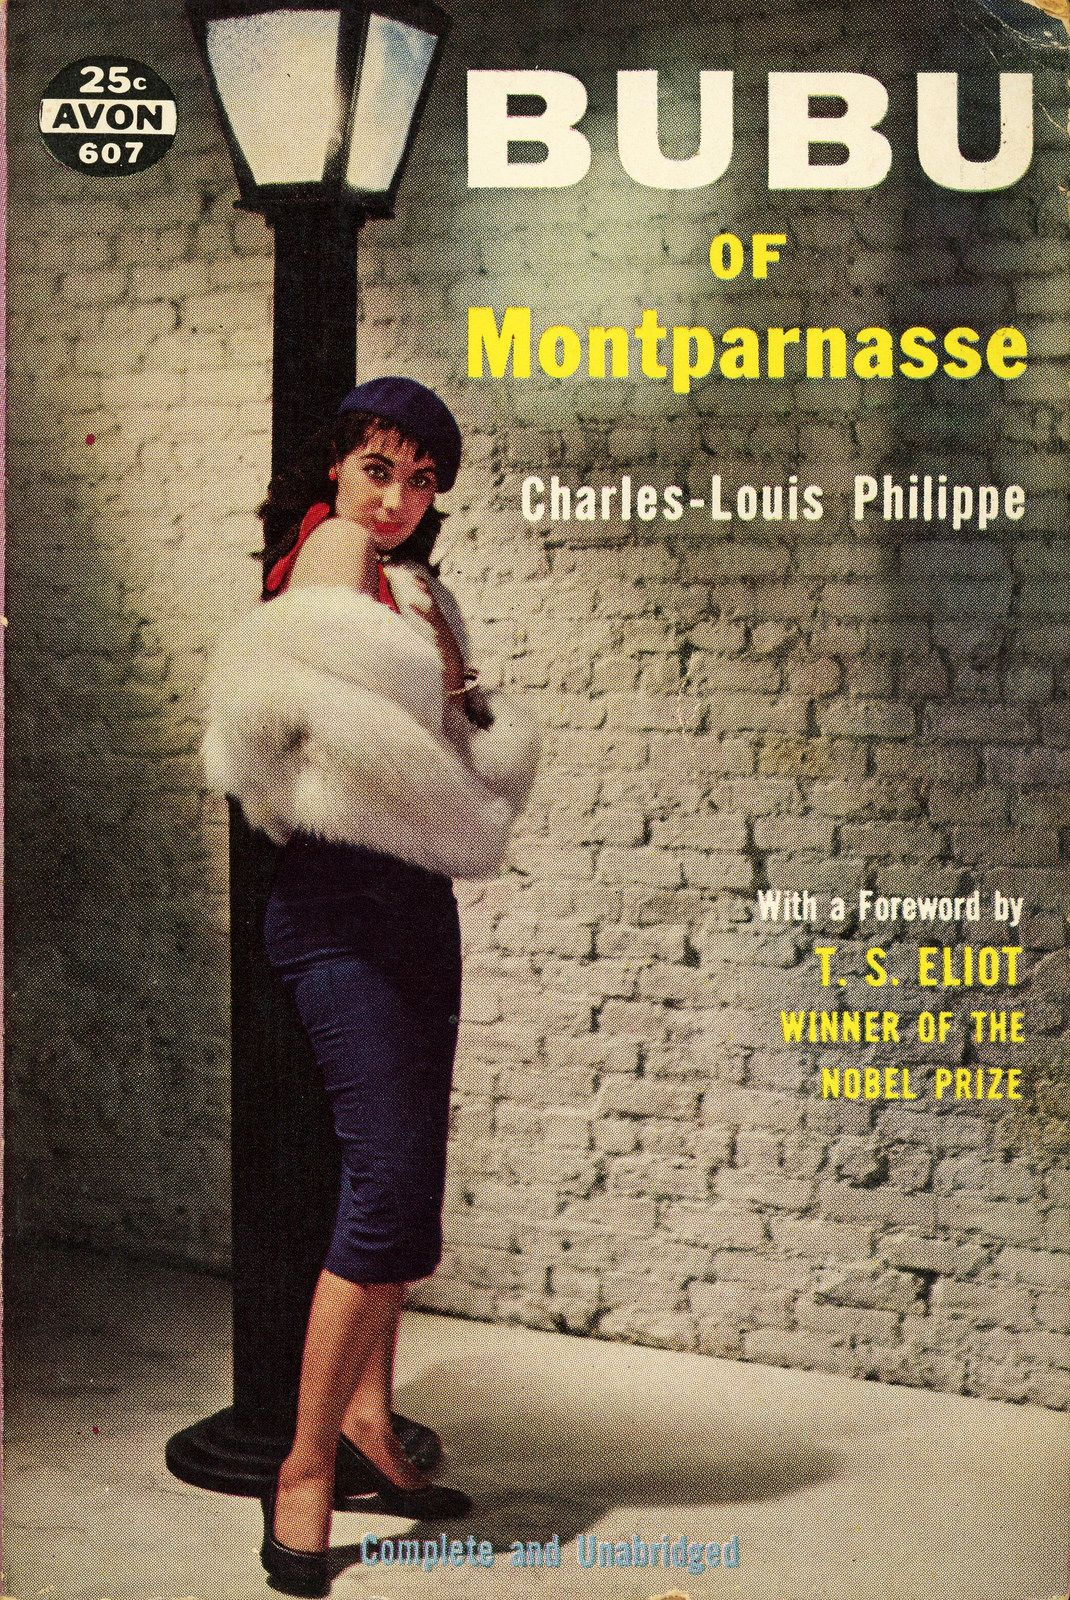 Bubu of Montparnasse, Philippe, Charles-Louis